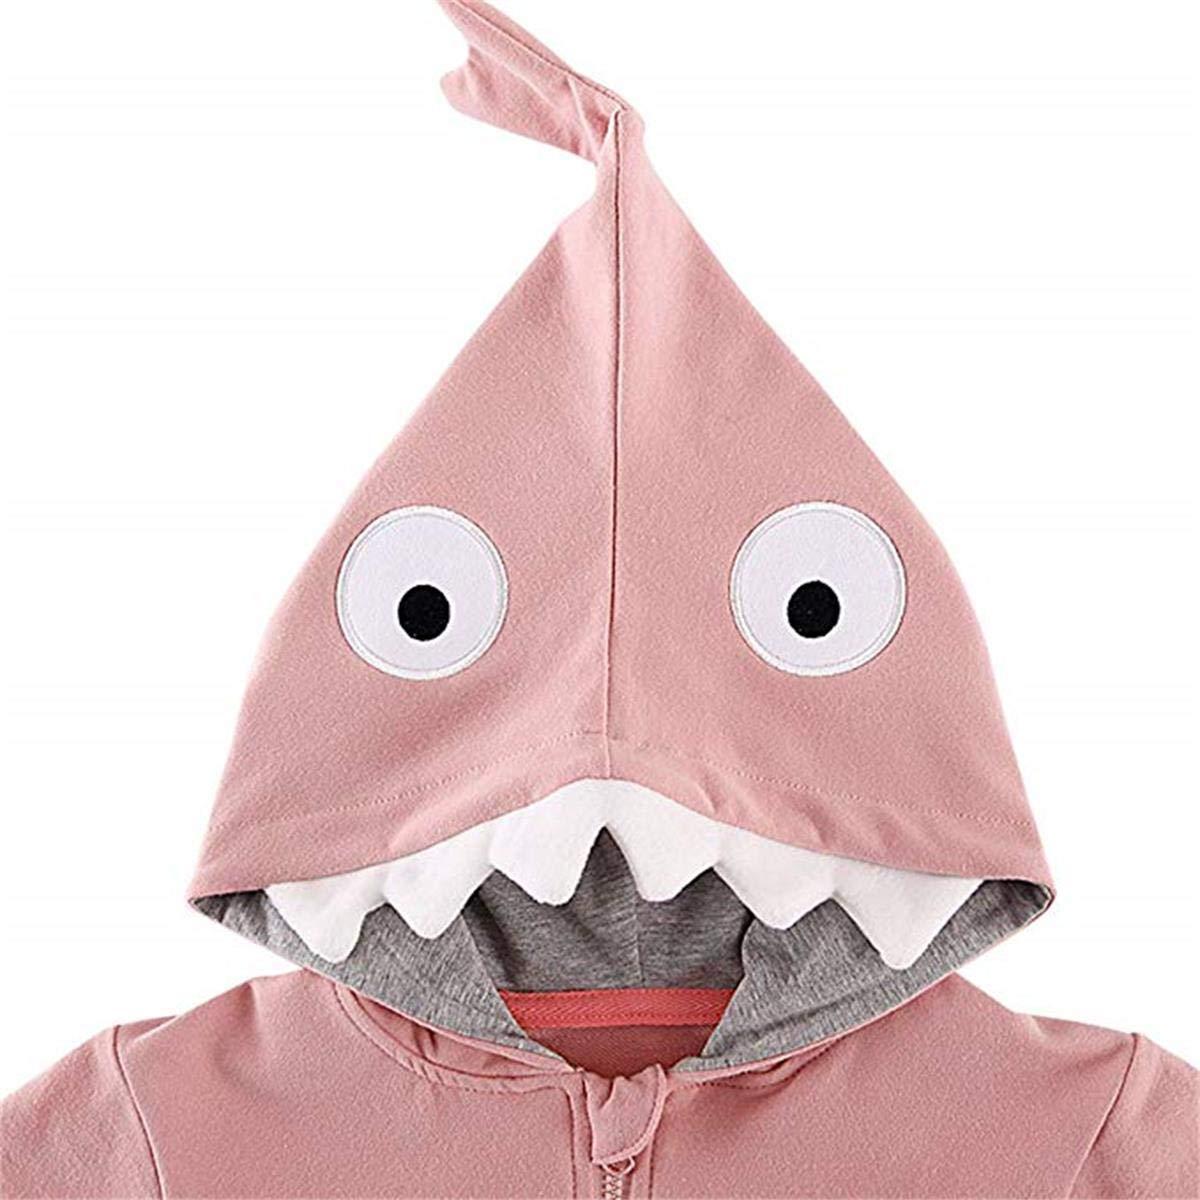 Lemohome Baby Boys Shark Outerwear Jacket Toddler Hooded Autumn Sweatshirt 1-4 Years